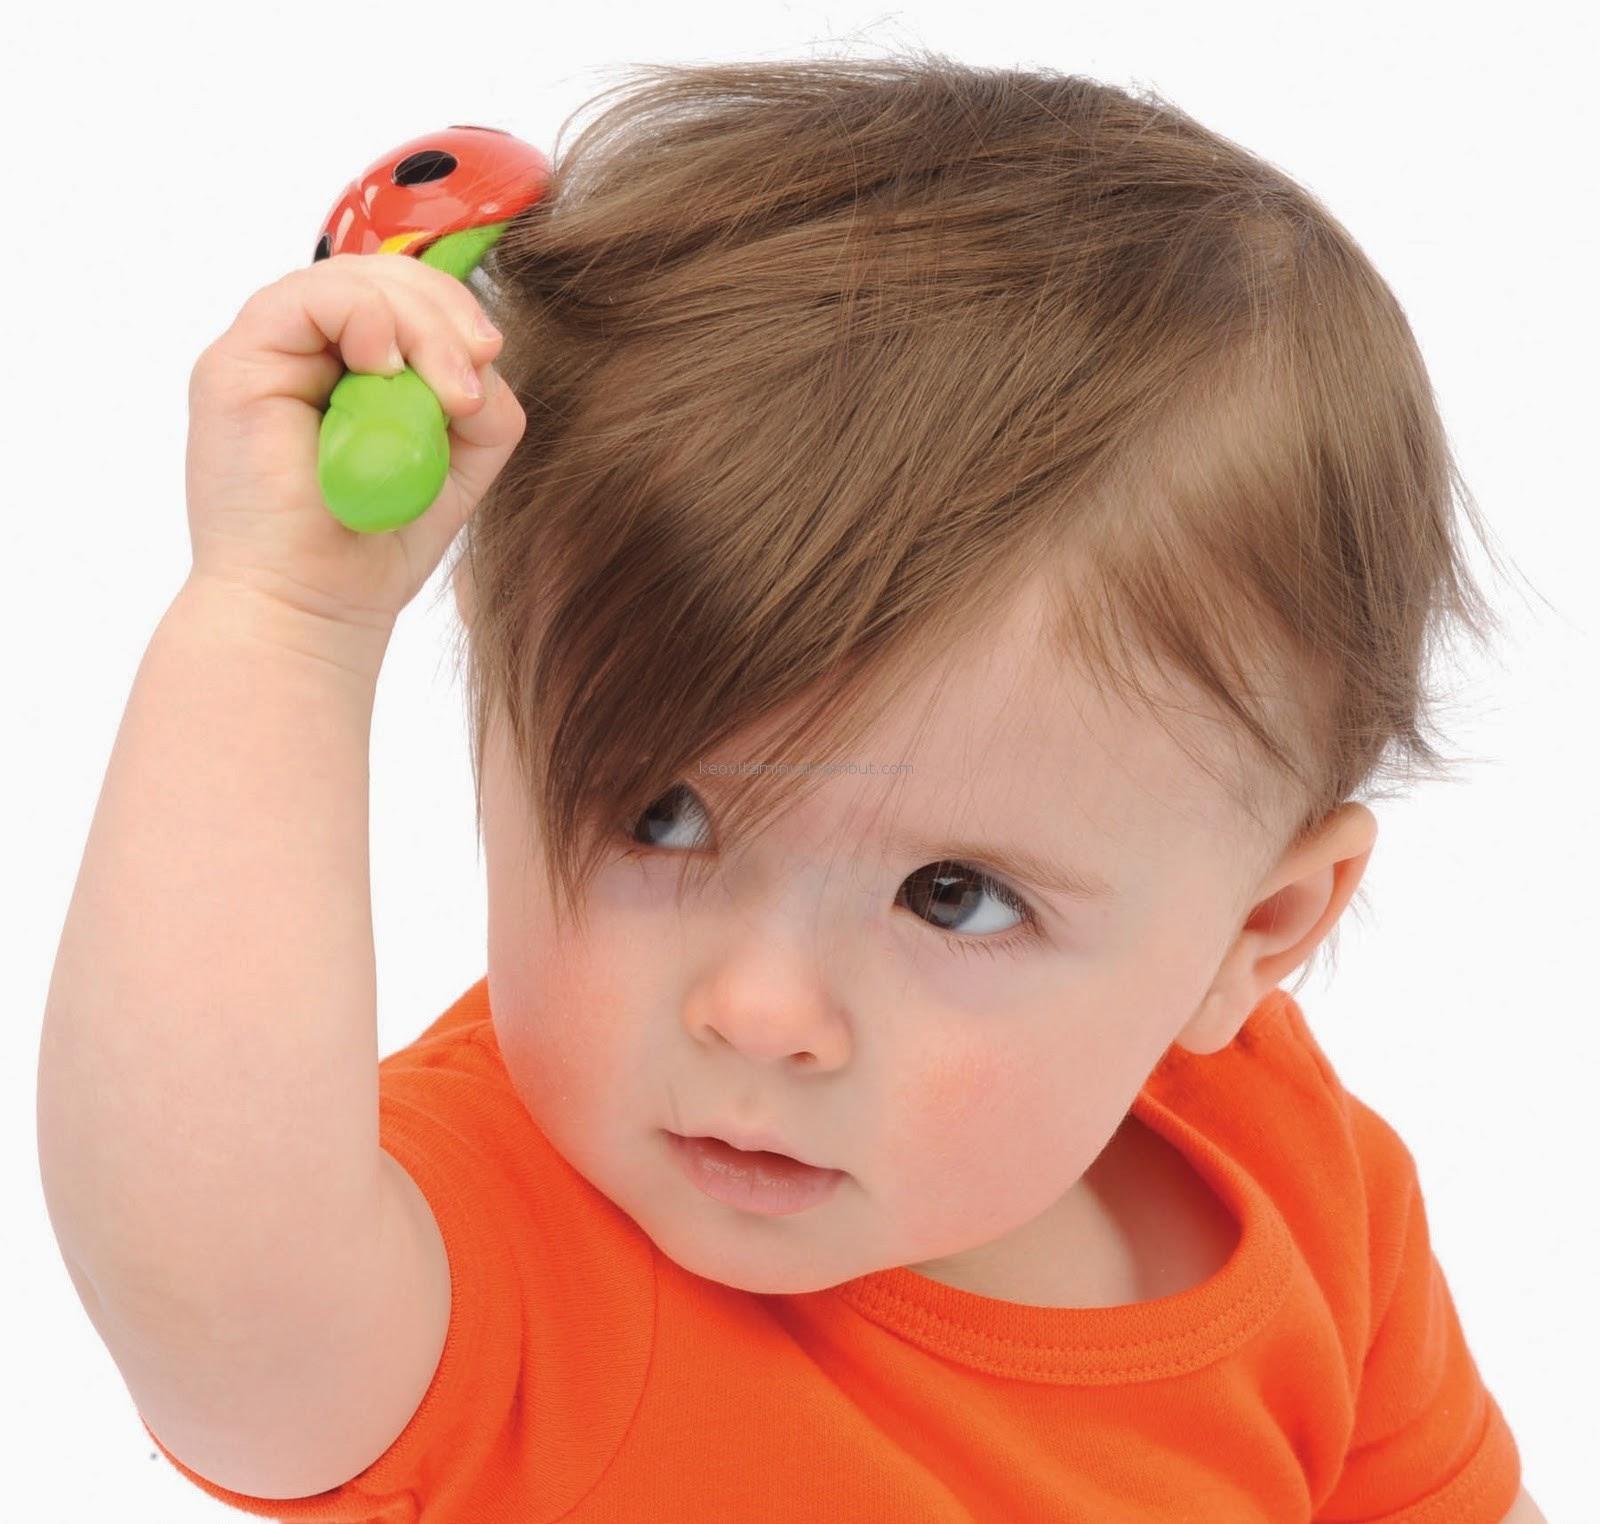 9 Tips Cerdas Merawat Rambut Sang Buah Hati Ulasan Seputar Ibu